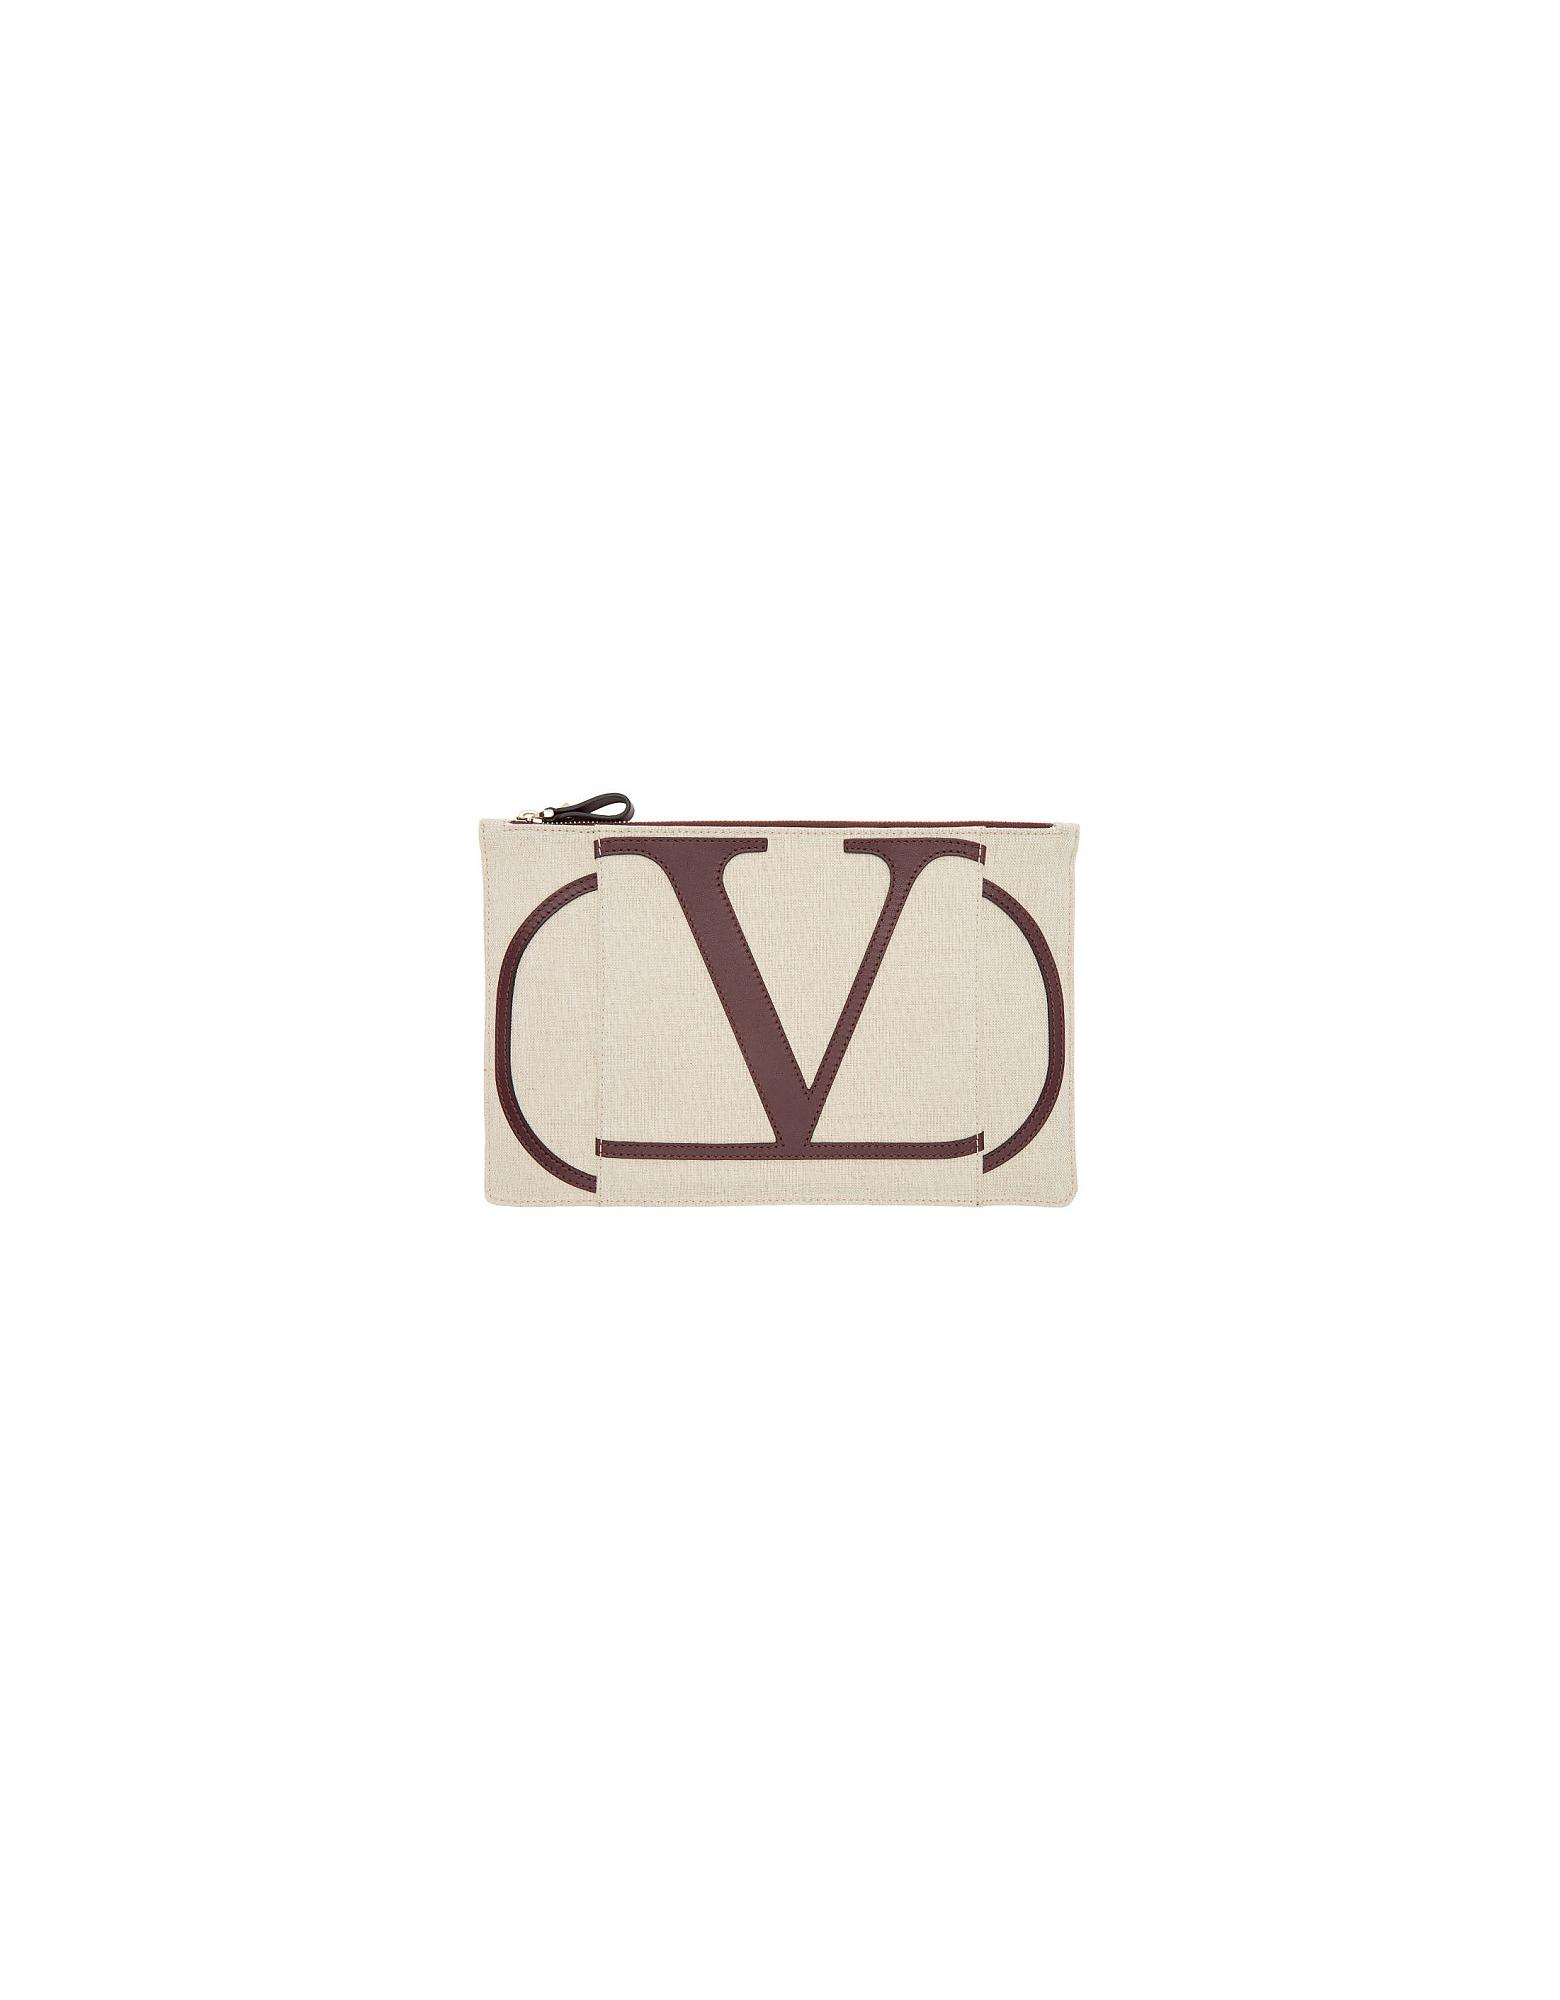 Valentino Designer Handbags, Beige Valentino Garavani Large VLogo Pouch